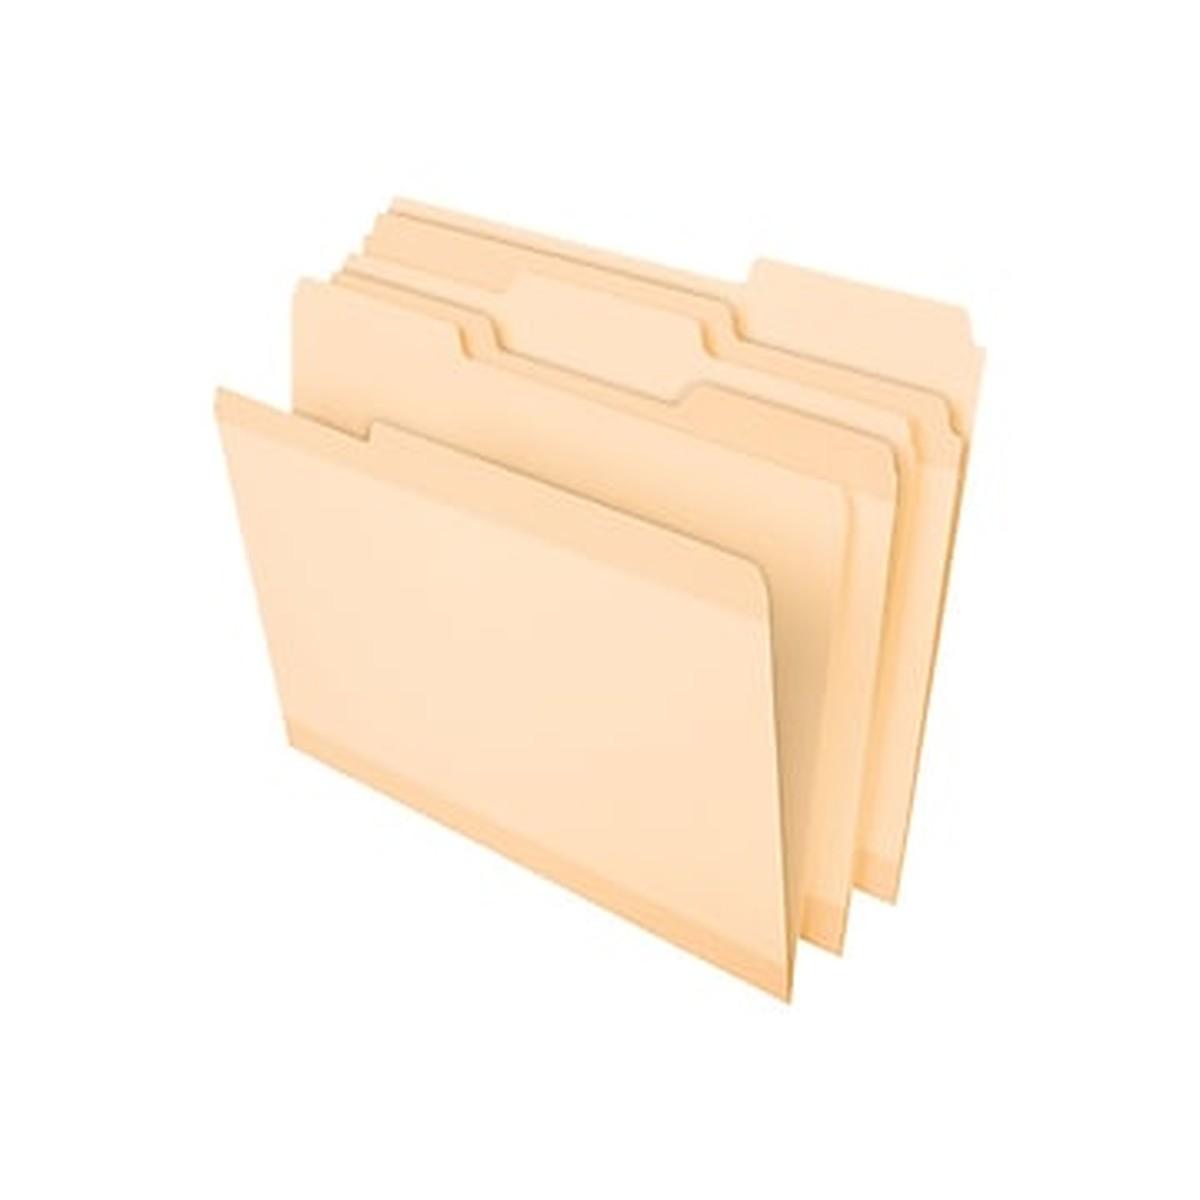 Poly Reinforced File Folder, 1/3-Cut Tabs, Letter Size, Manila, 24/Pack